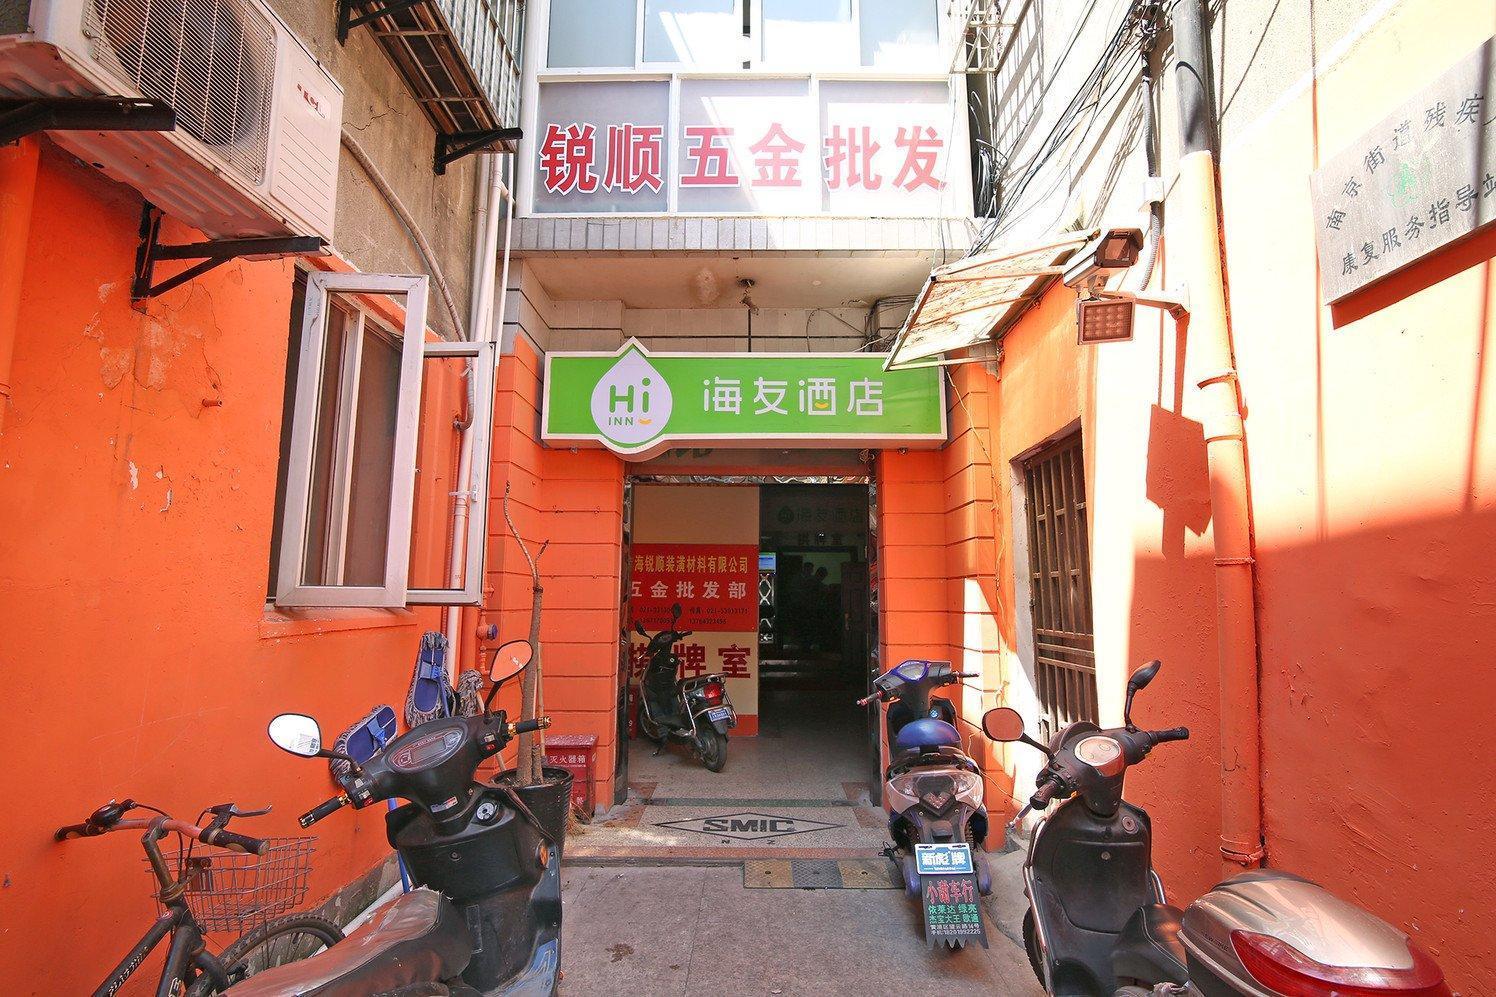 Hi Inn Shanghai Nanjing Dong Road Center